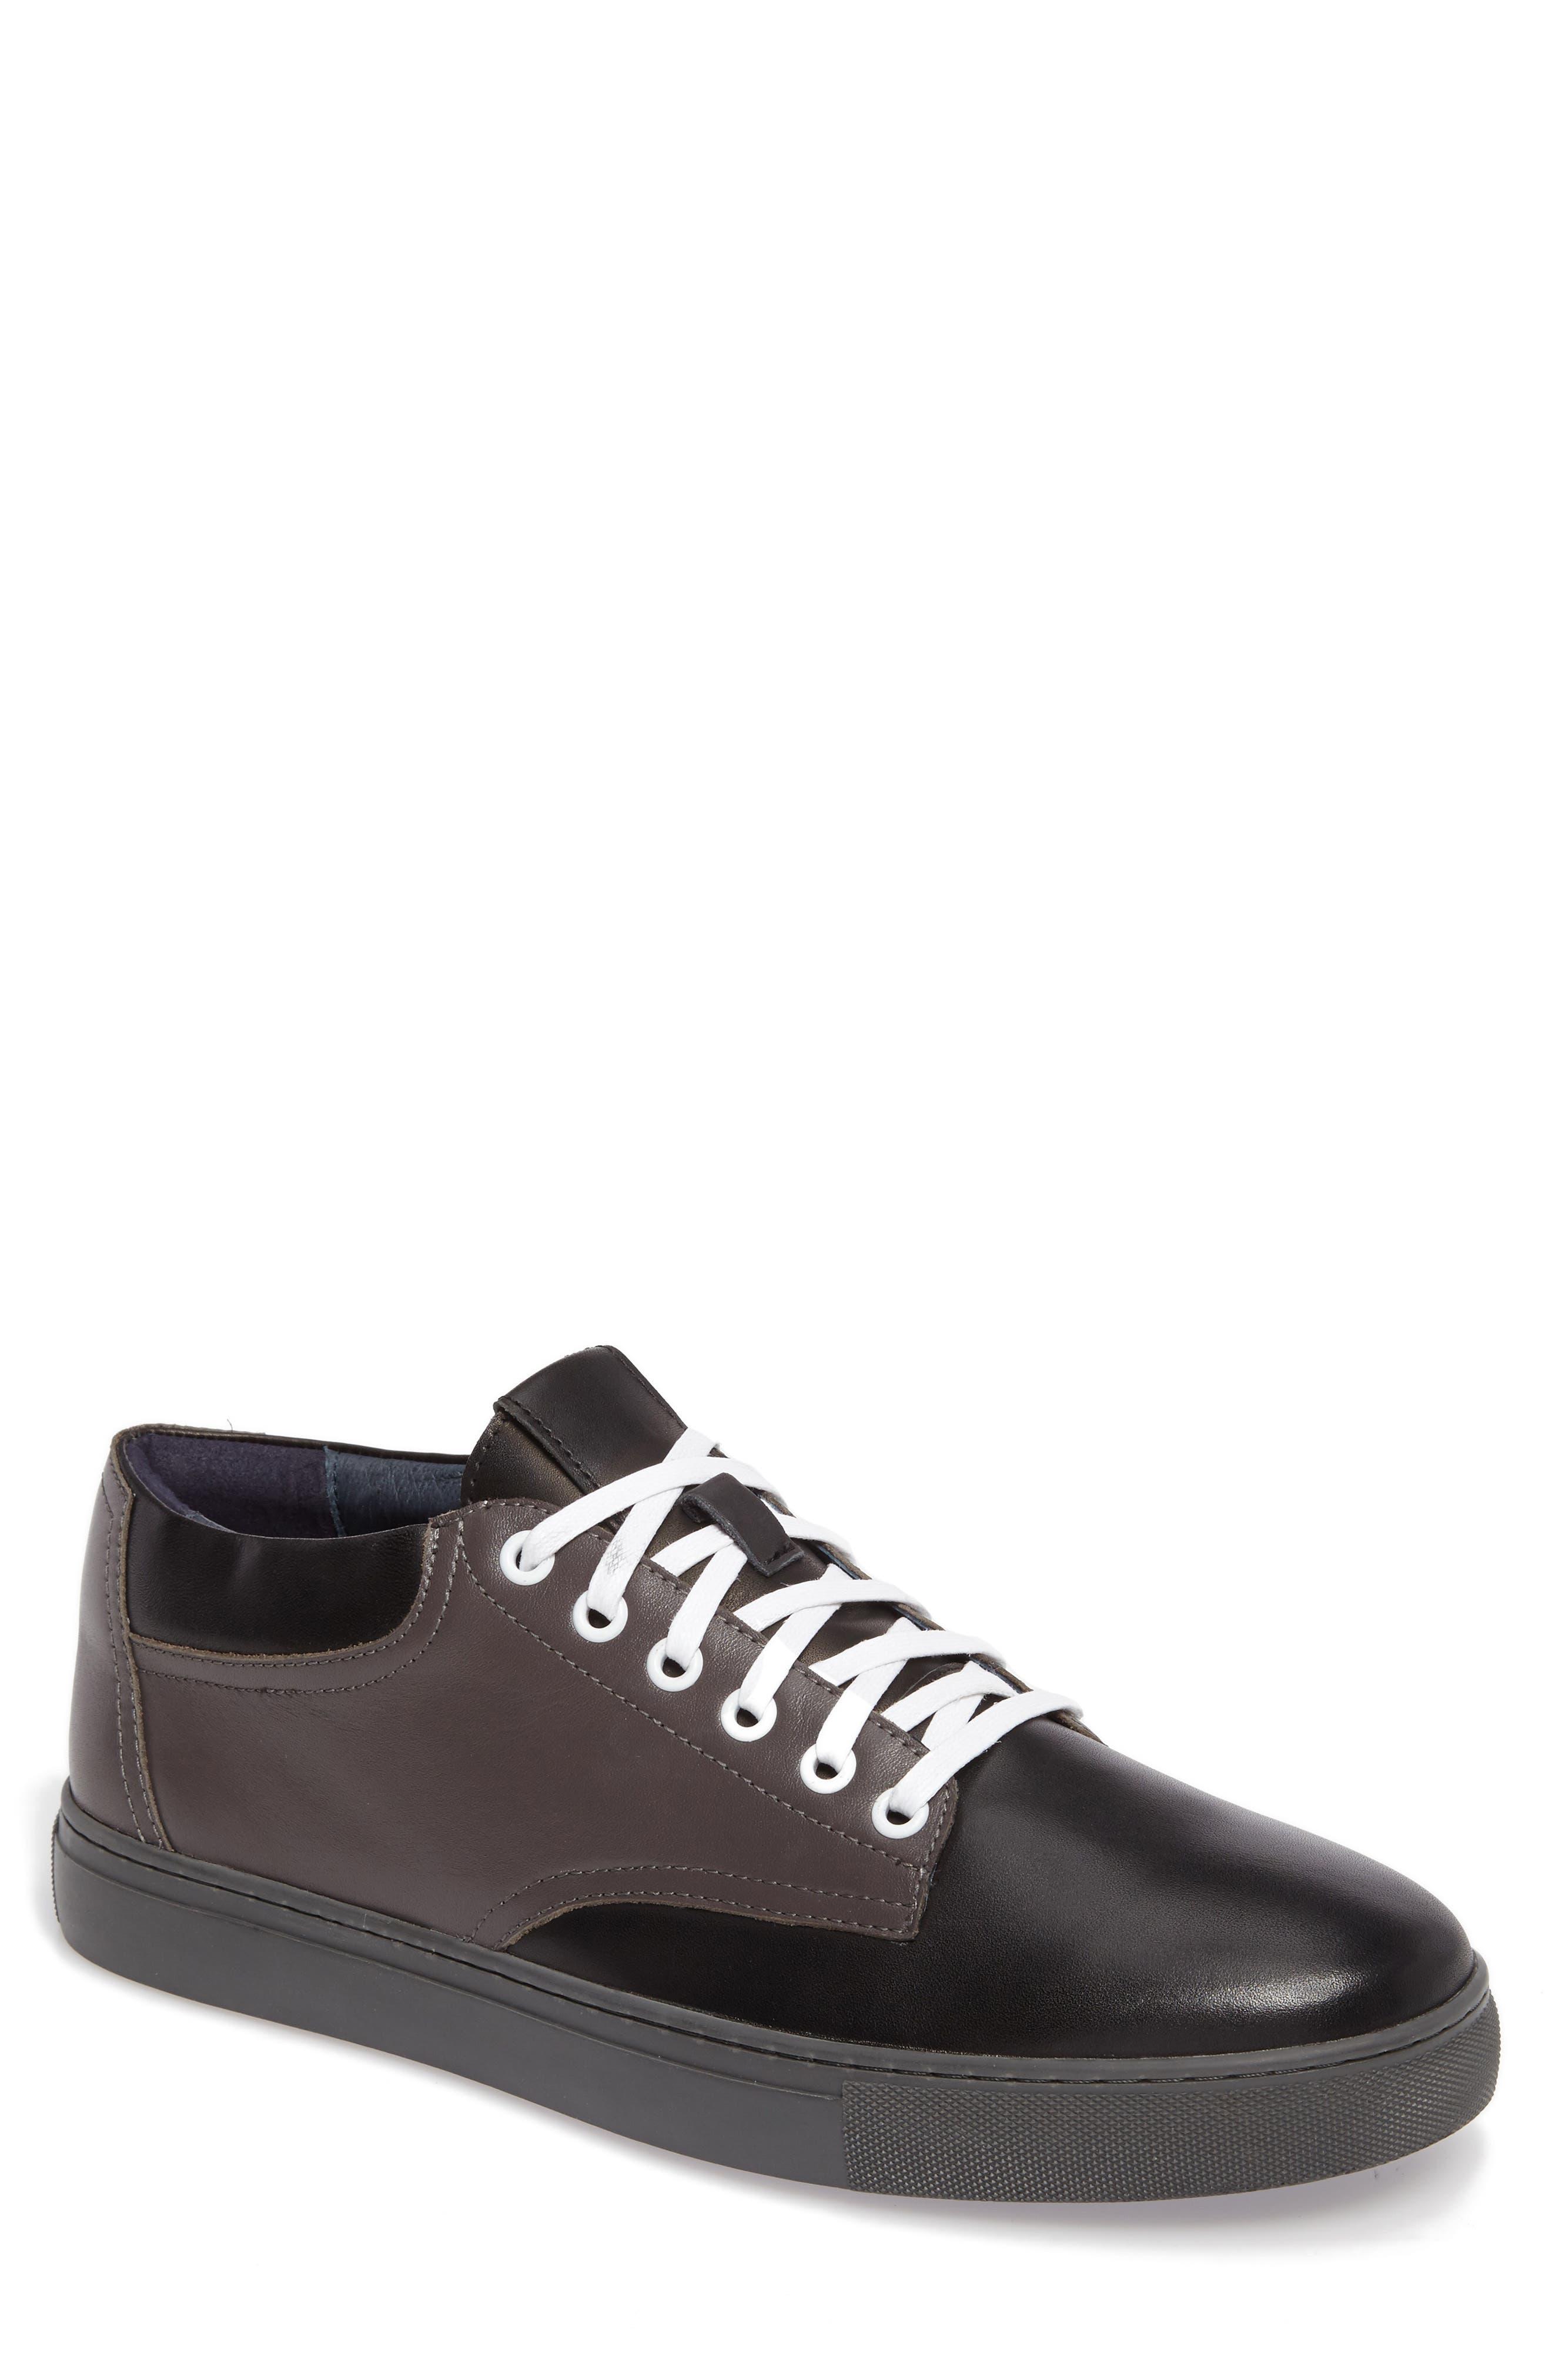 Main Image - Zanzara Ralston Sneaker (Men)